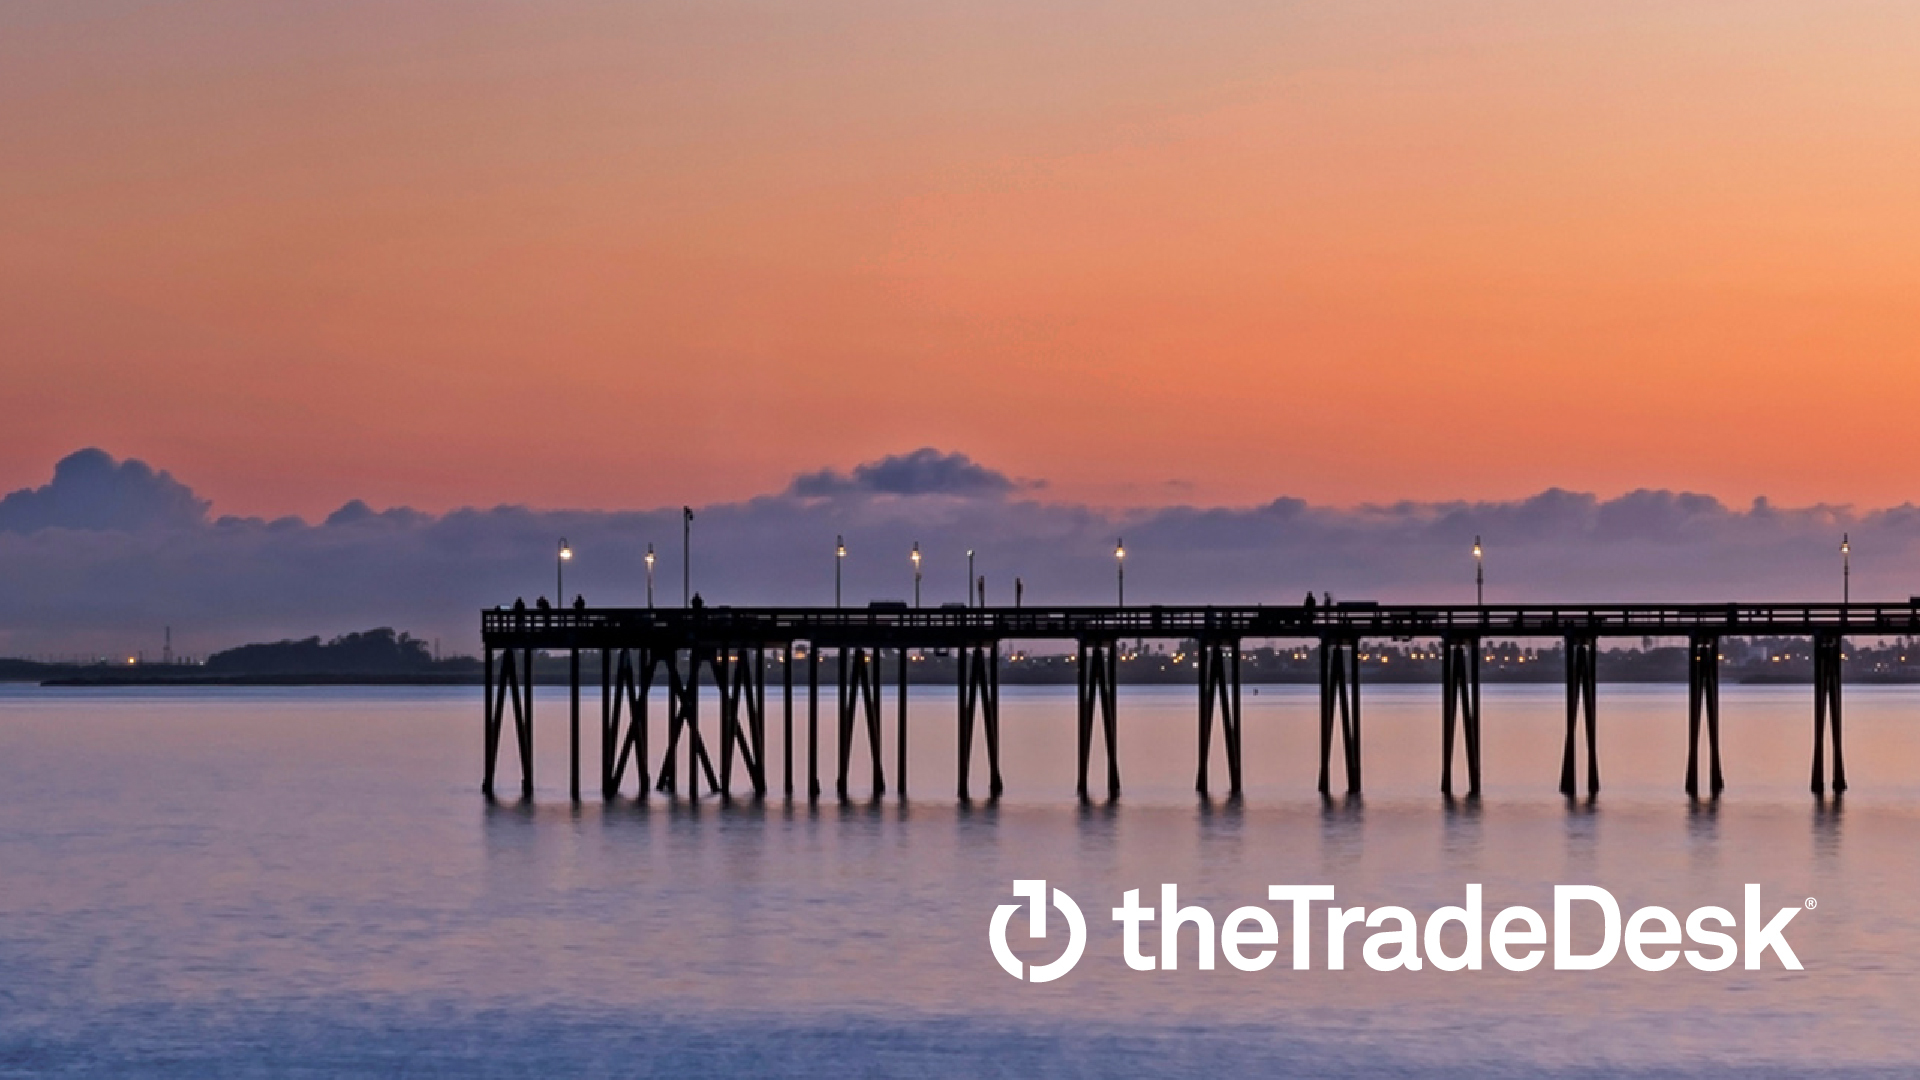 Media for Humankind | The Trade Desk